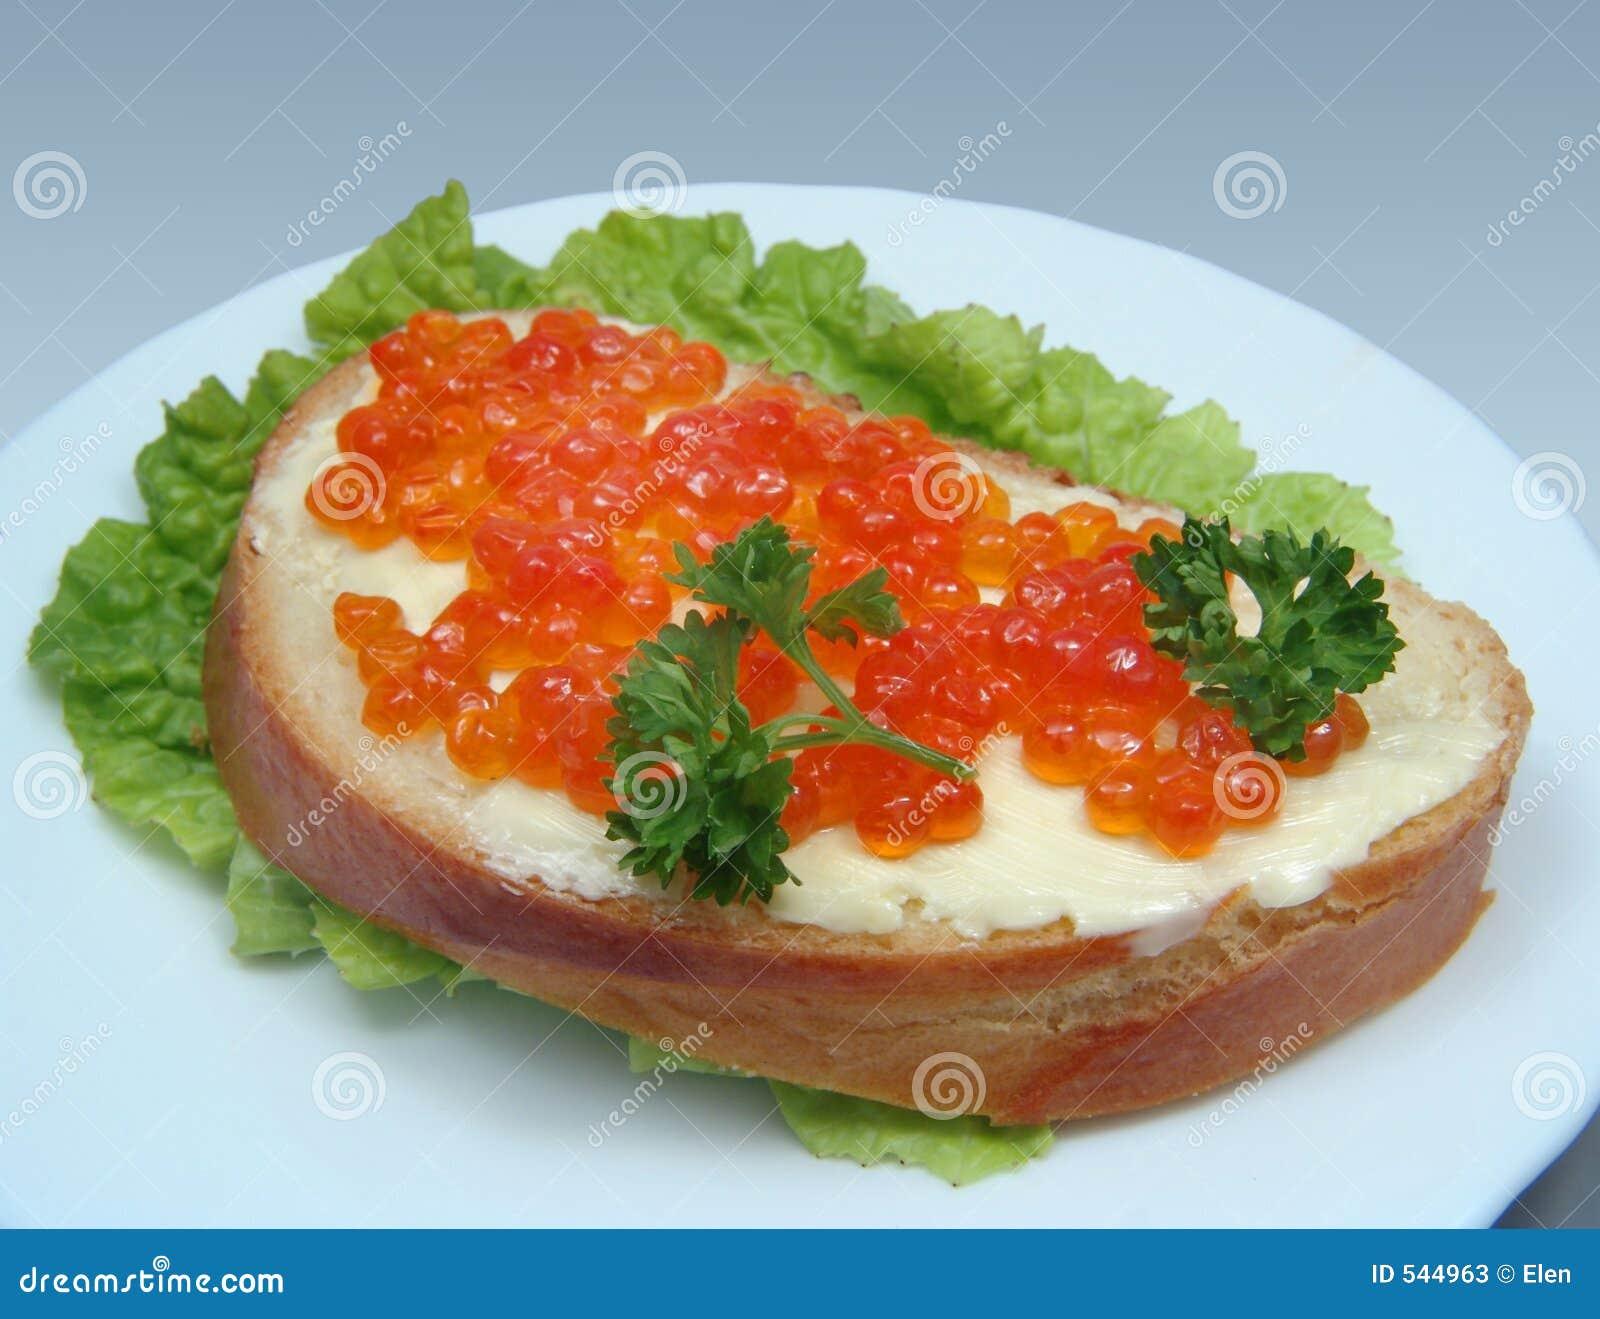 Sanduíche com caviar salmon